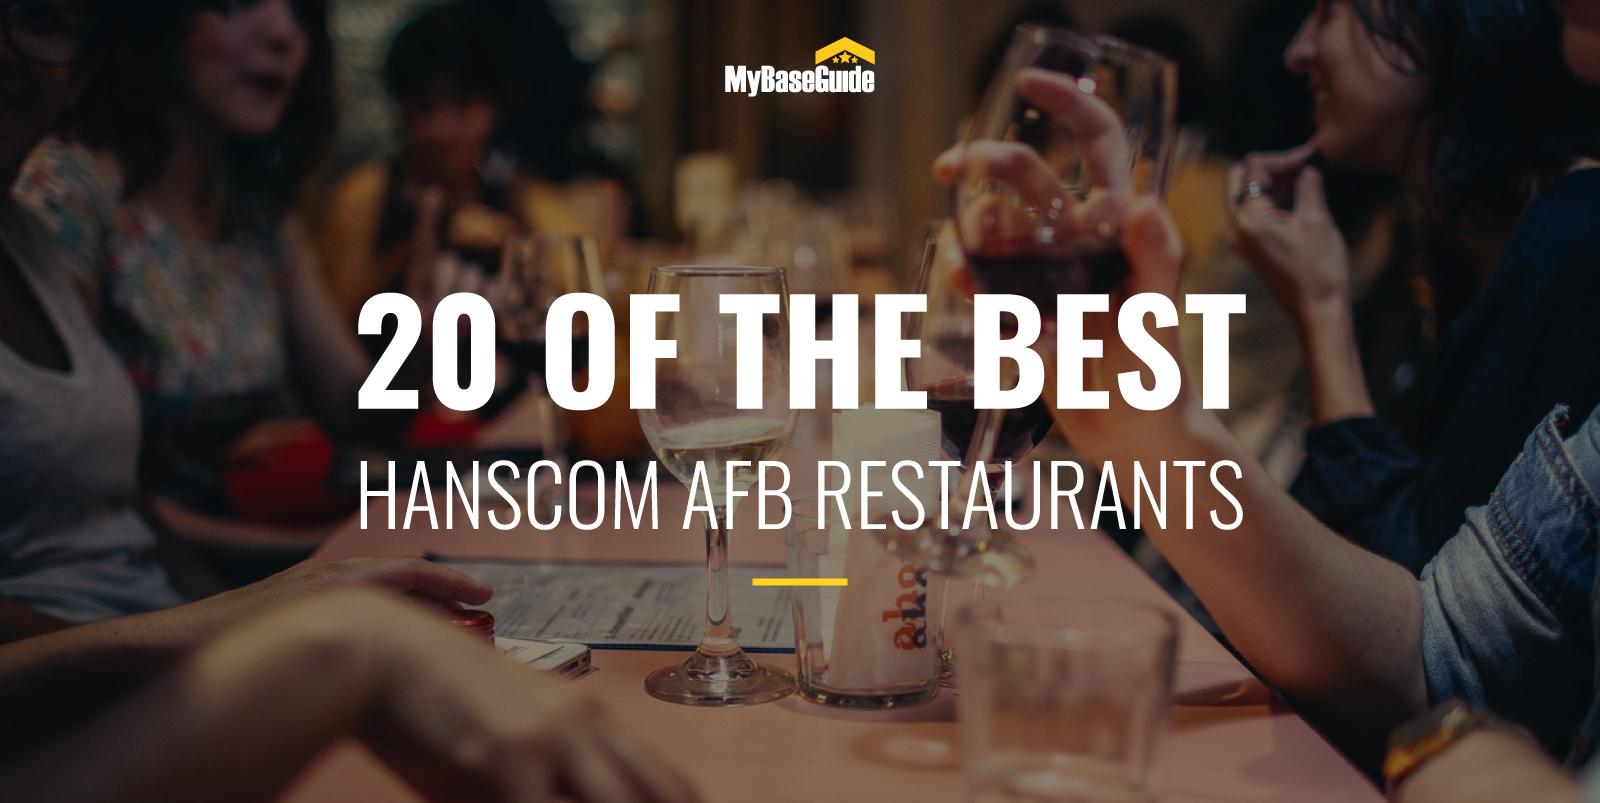 20 of the Best Restaurants Near Hanscom AFB (2021 Edition)